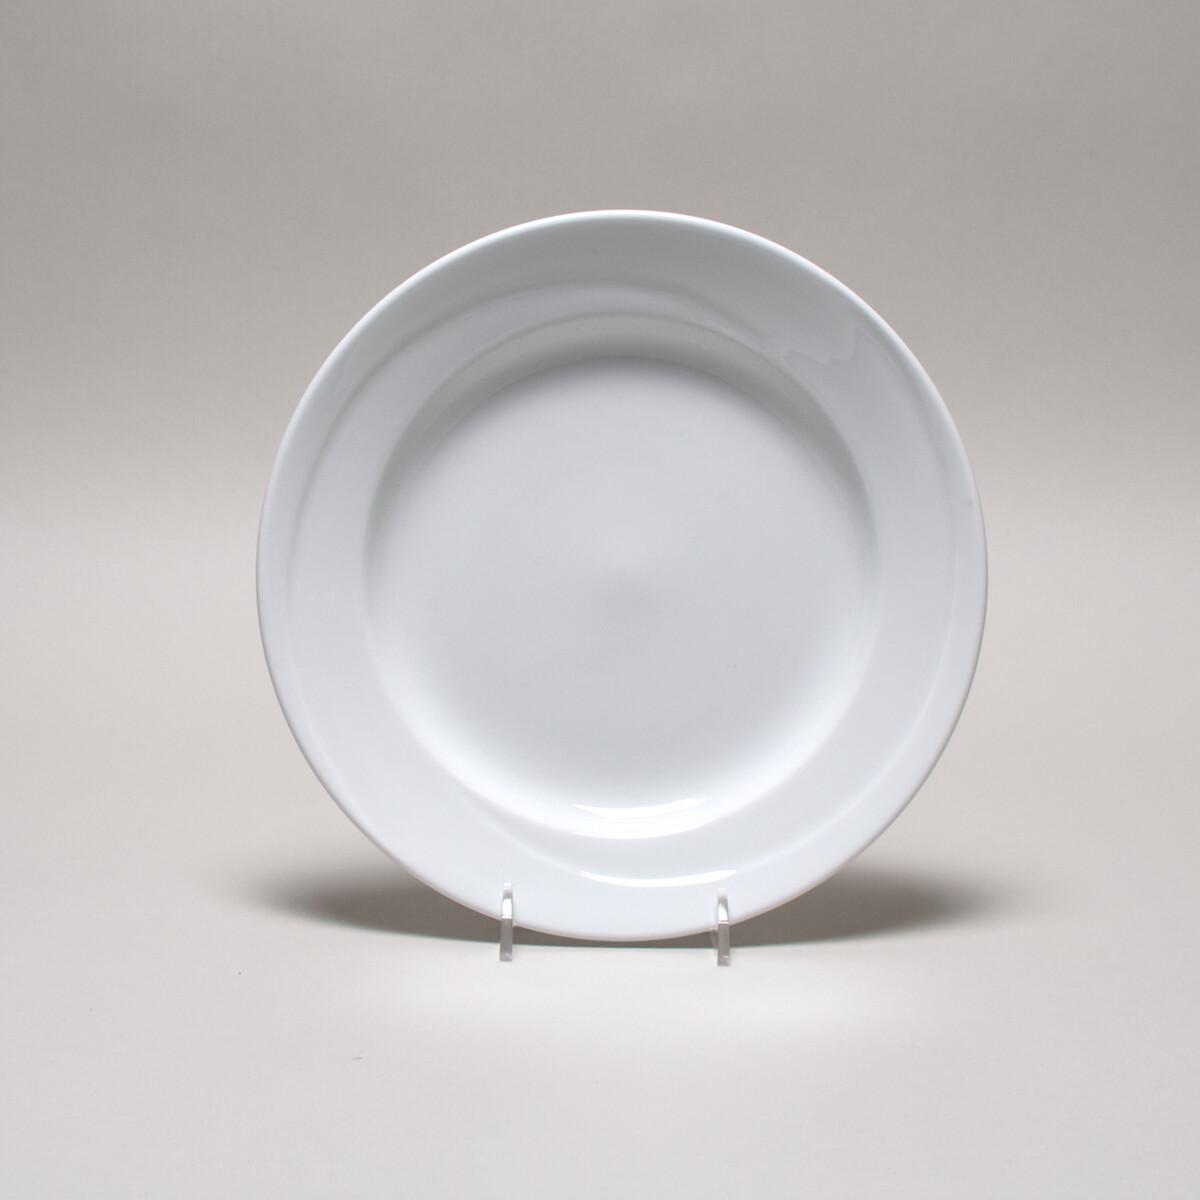 "Scandia Plate 8 1/4""- 3 Dozen/ case"